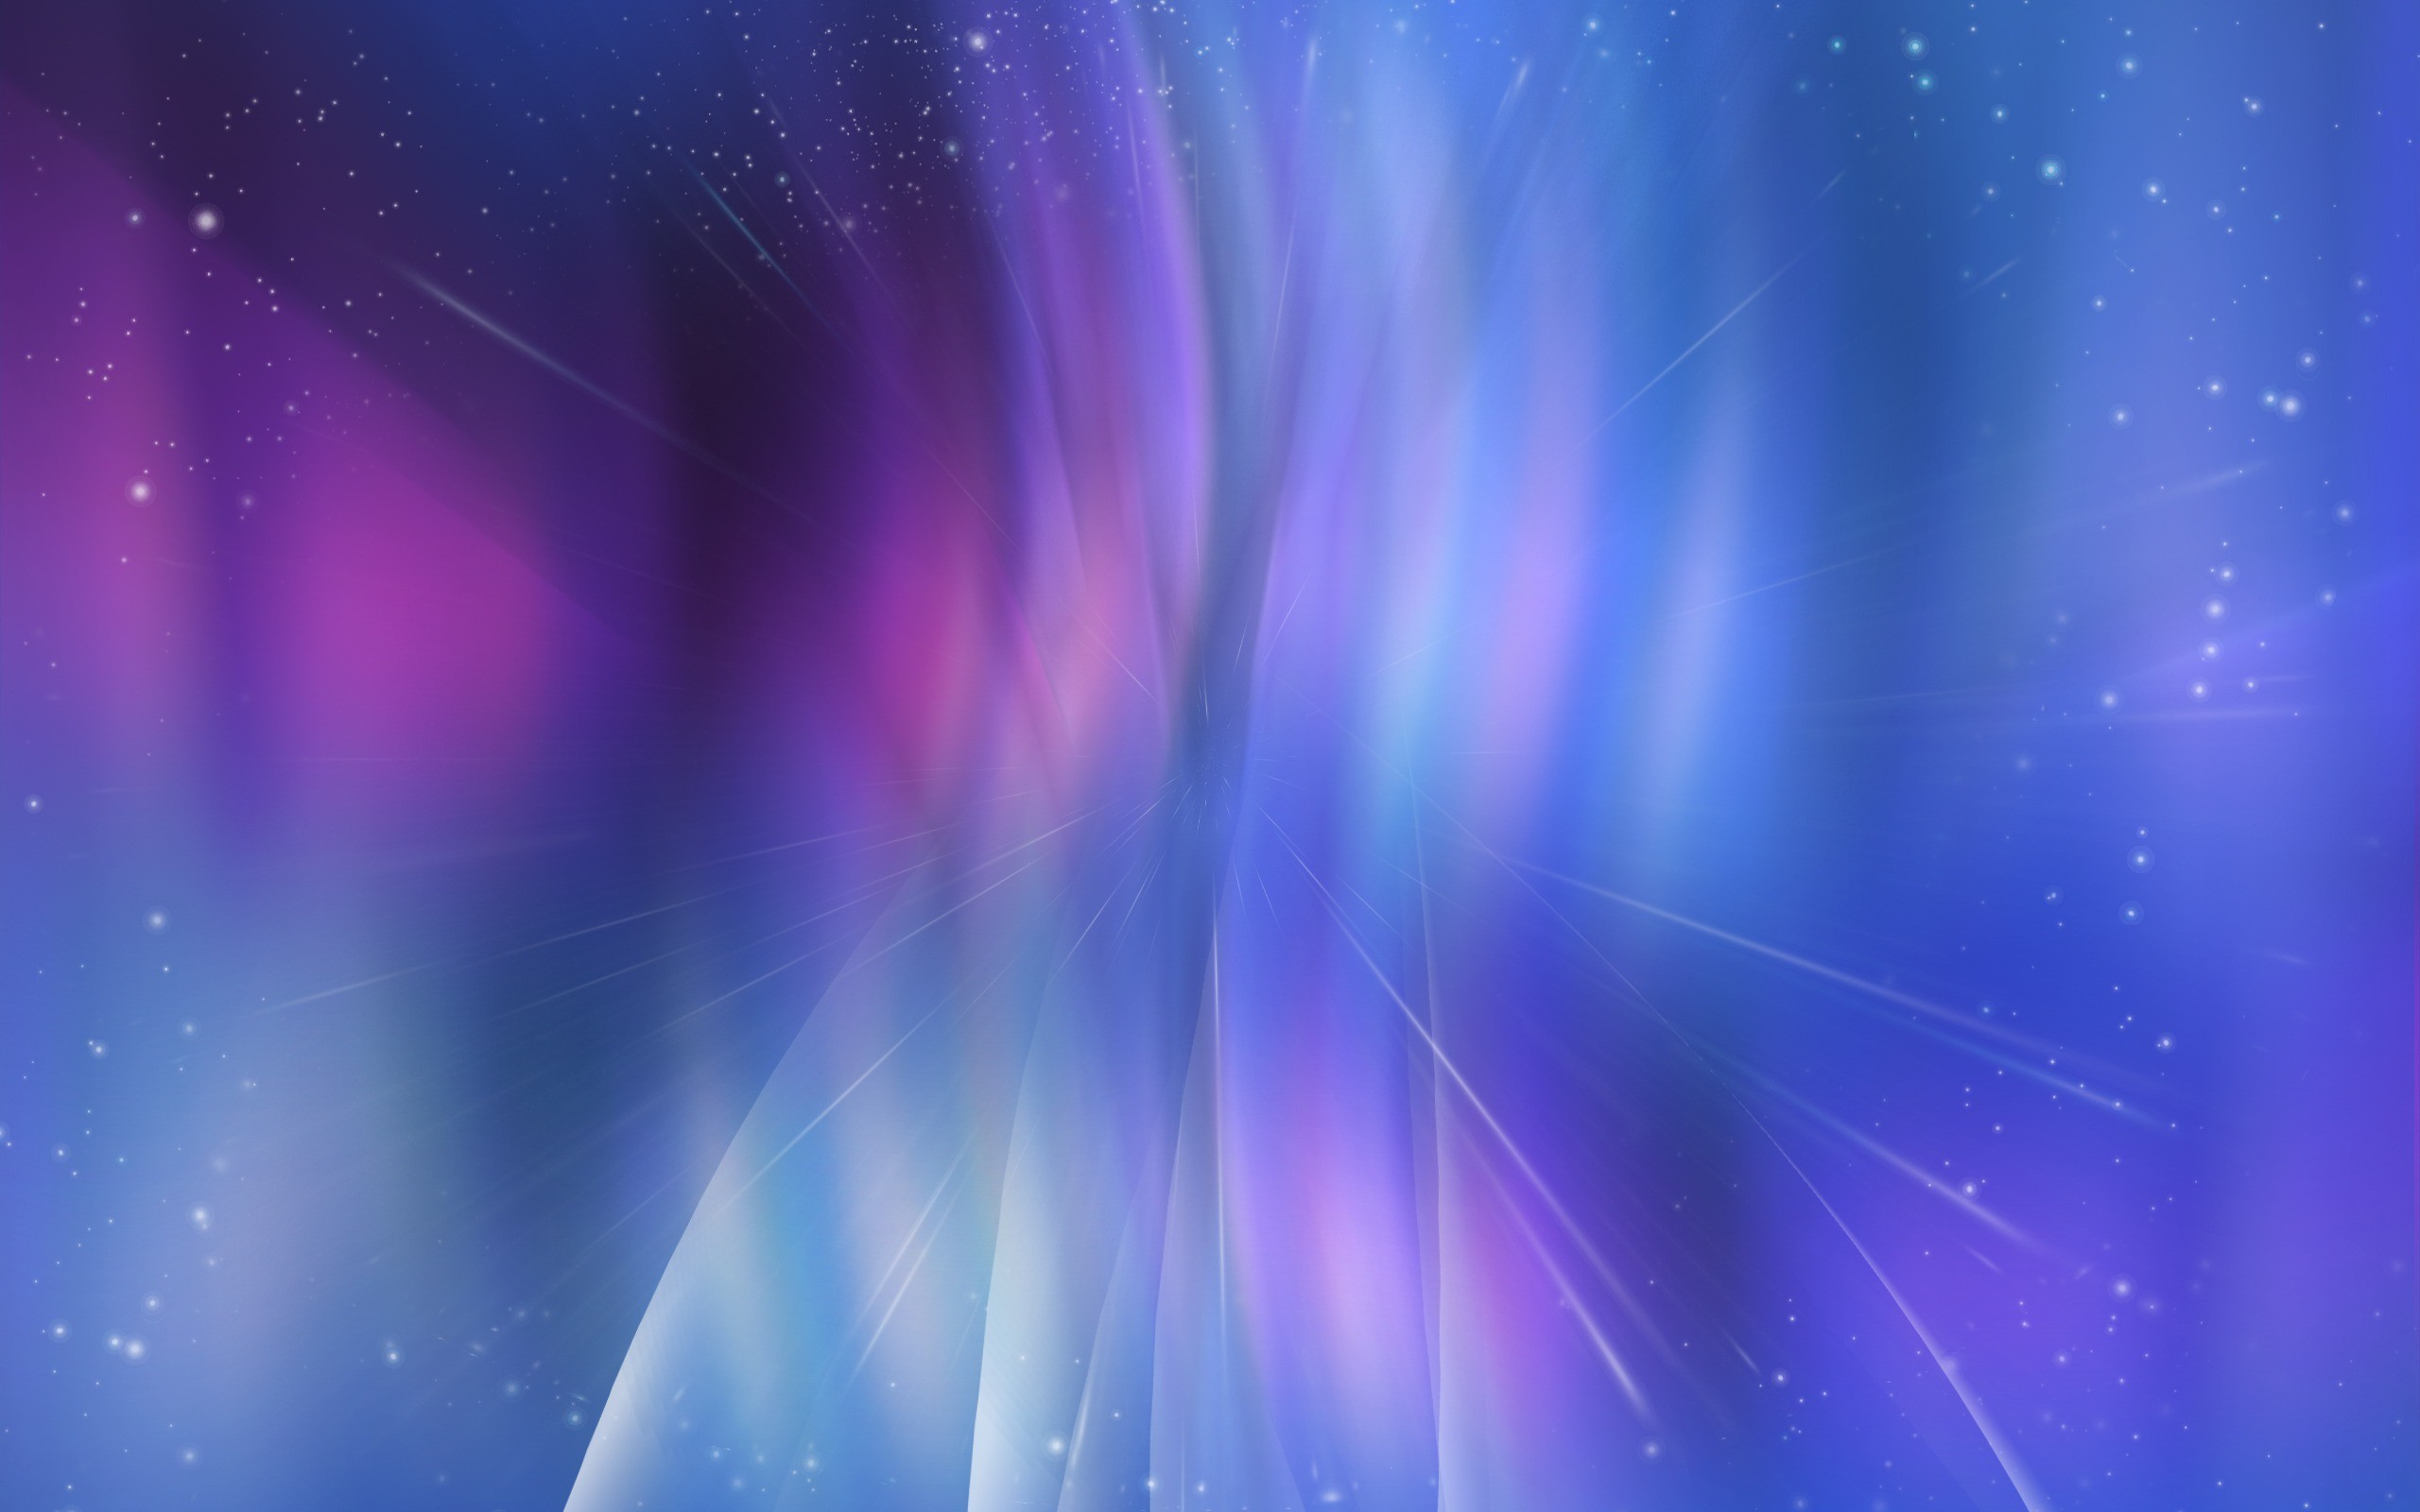 … pink purple and blue wallpapers wallpapersafari …